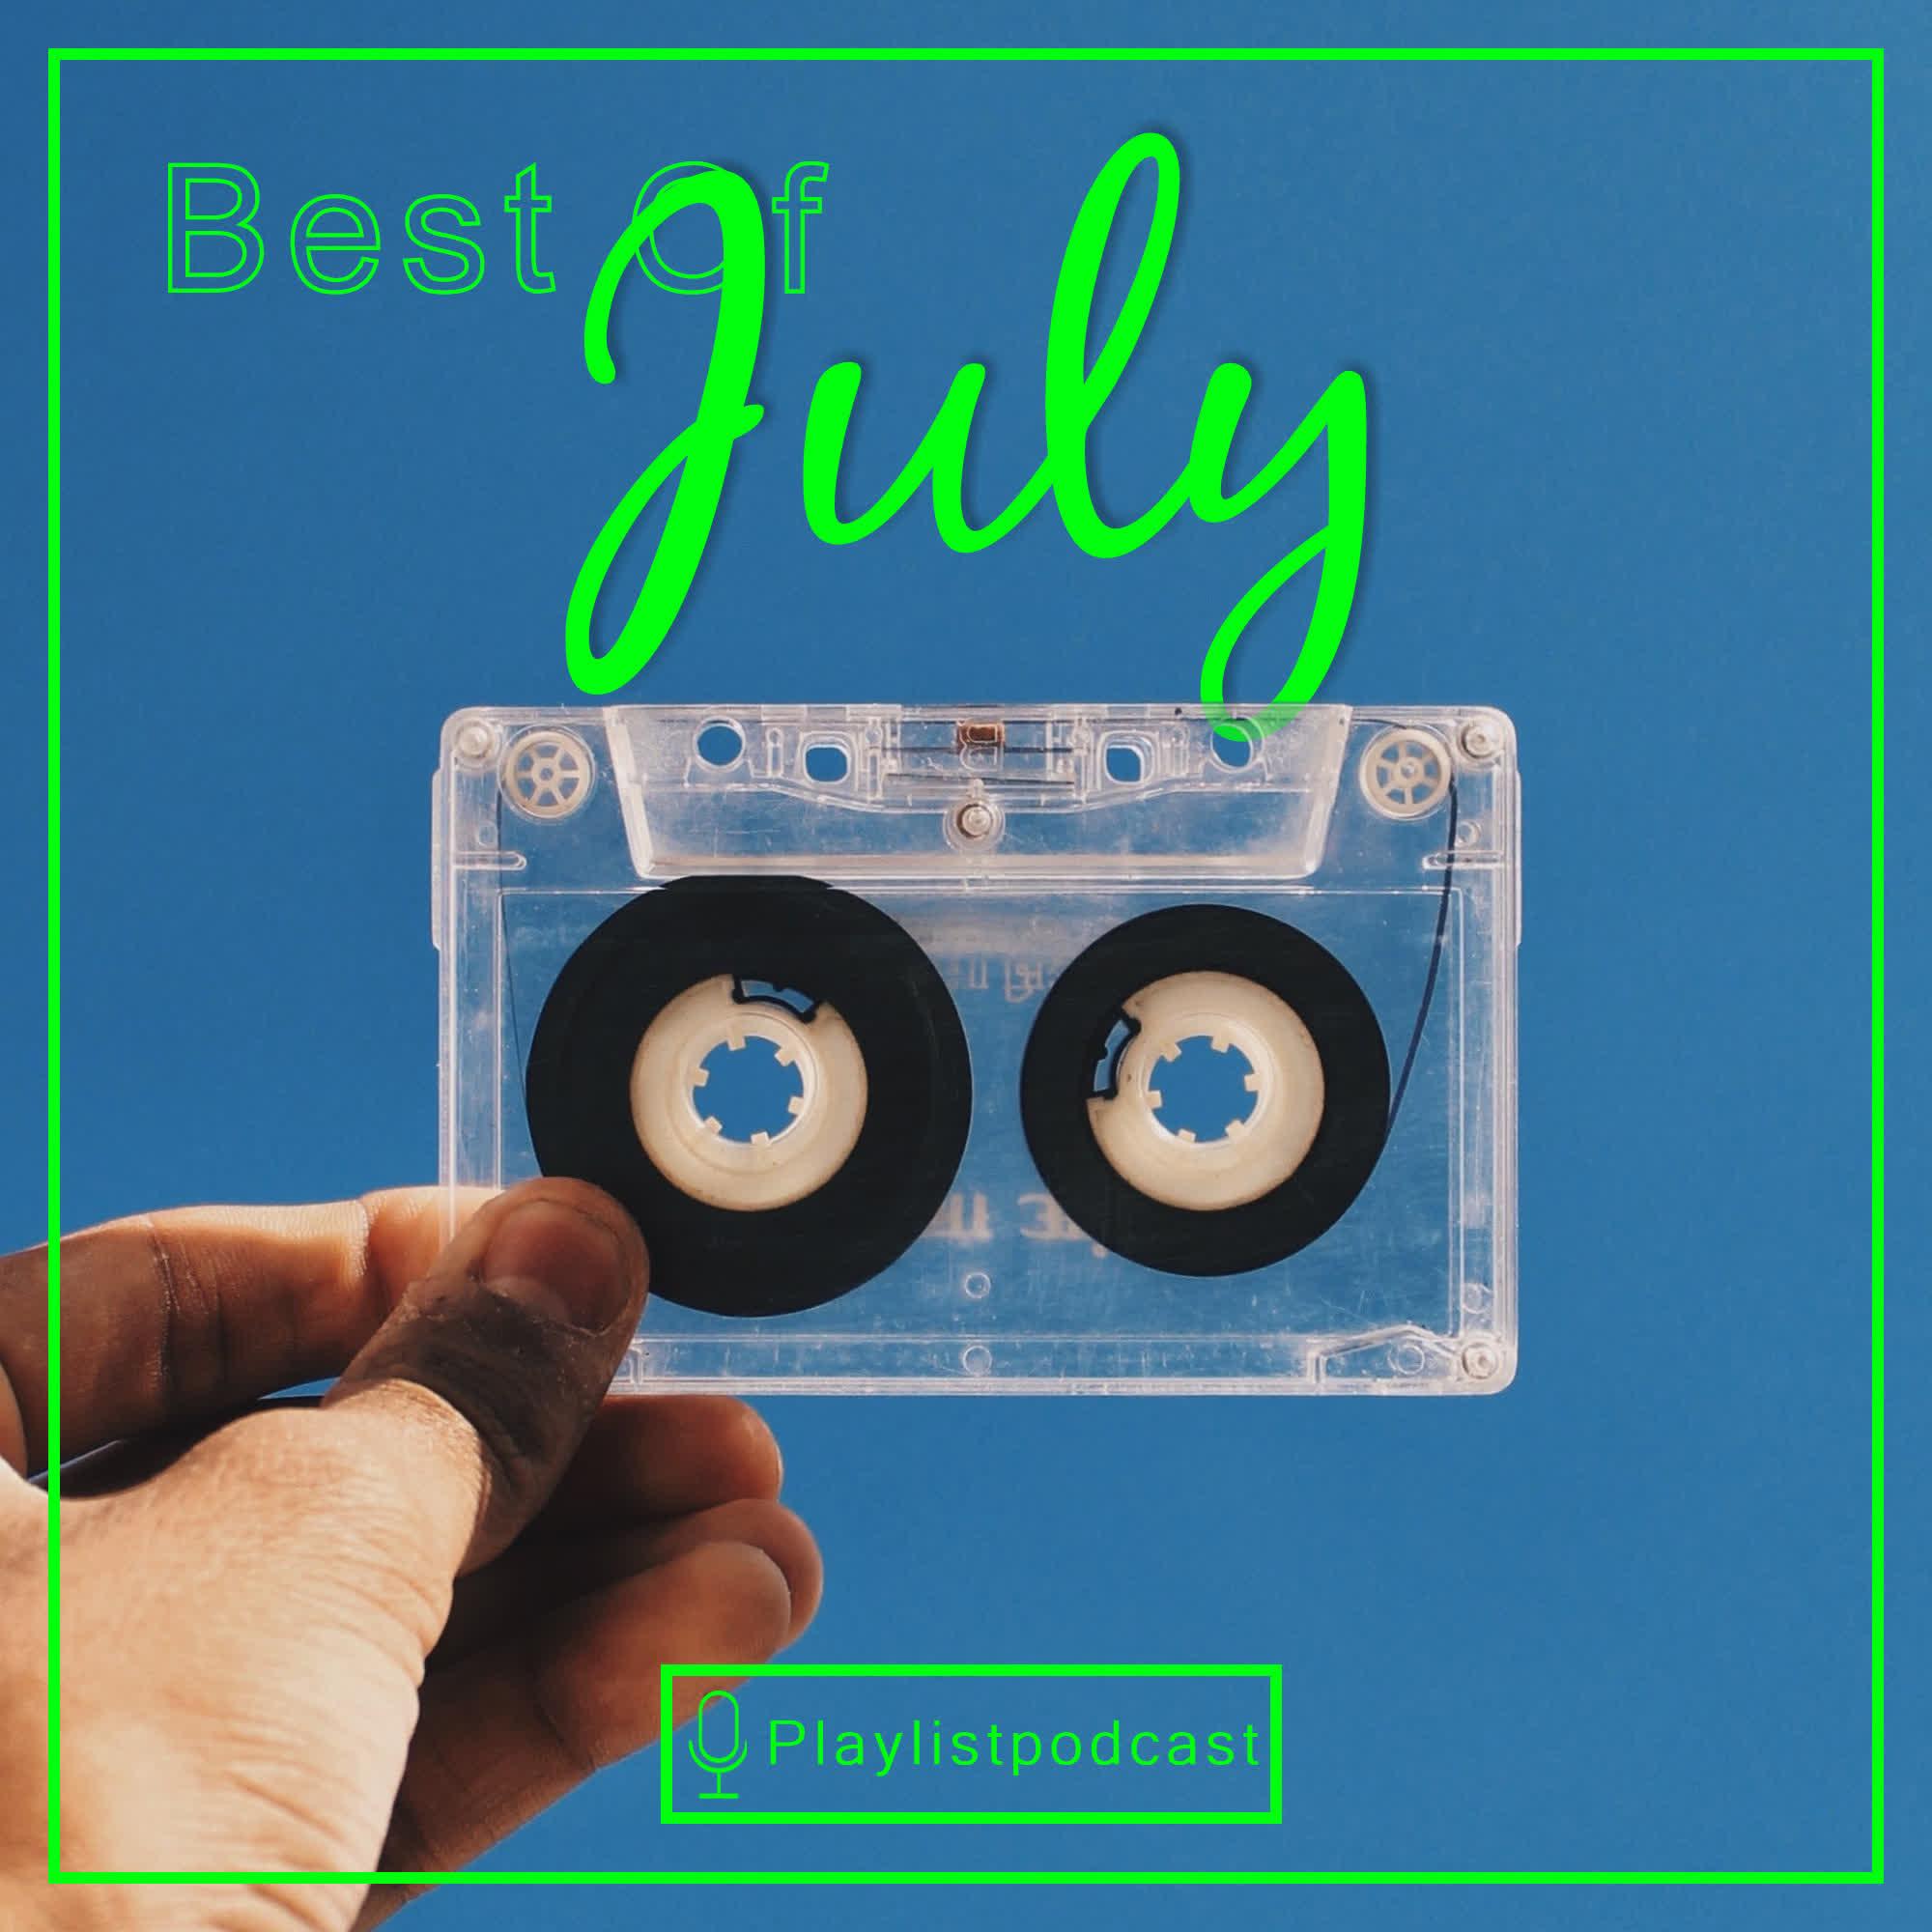 July 2020 - نیوکست